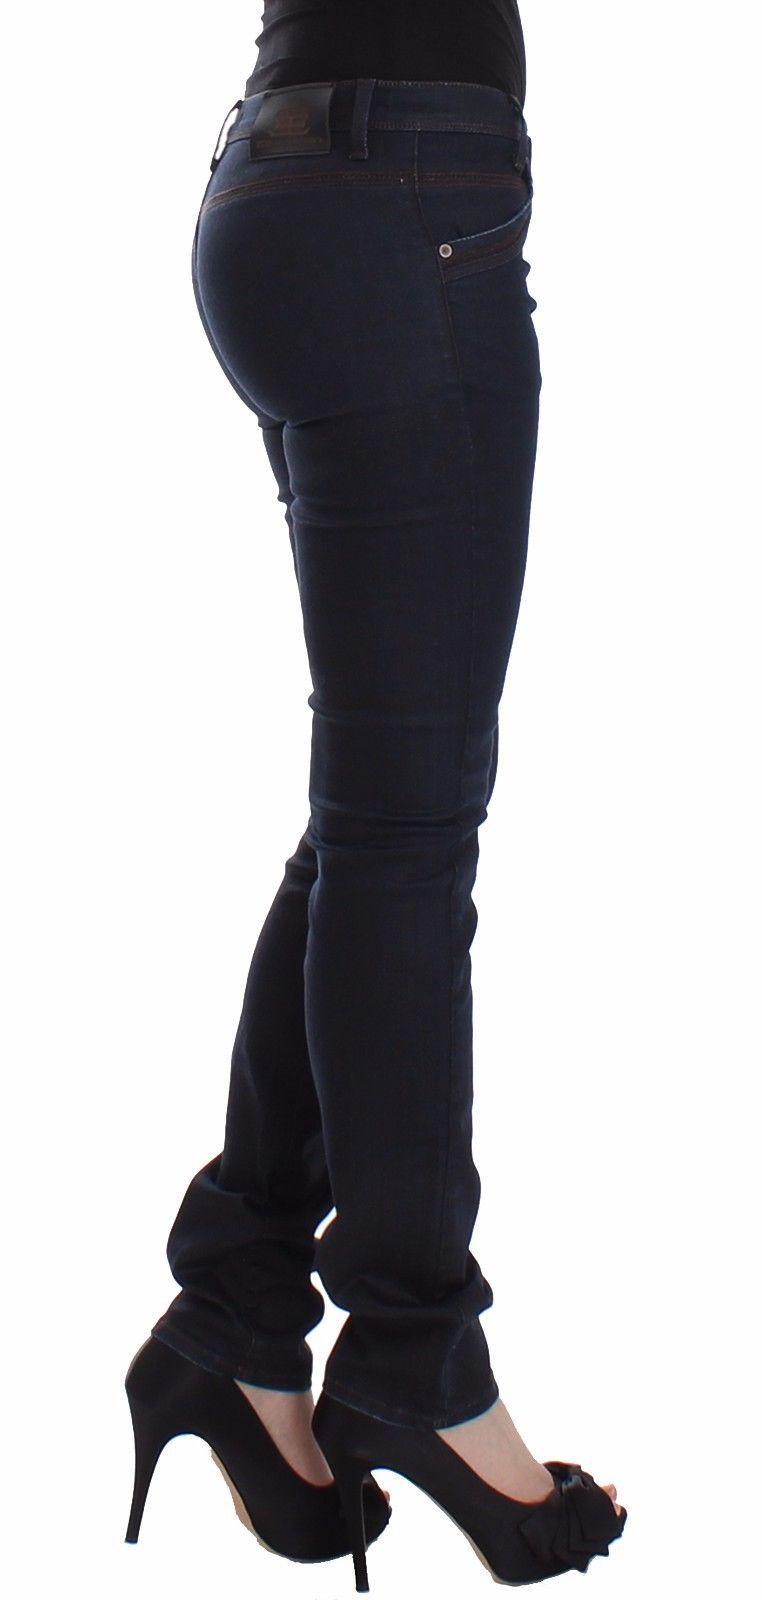 Ermanno Scervino Blue Slim Jeans Denim Pants Skinny Leg Stretch